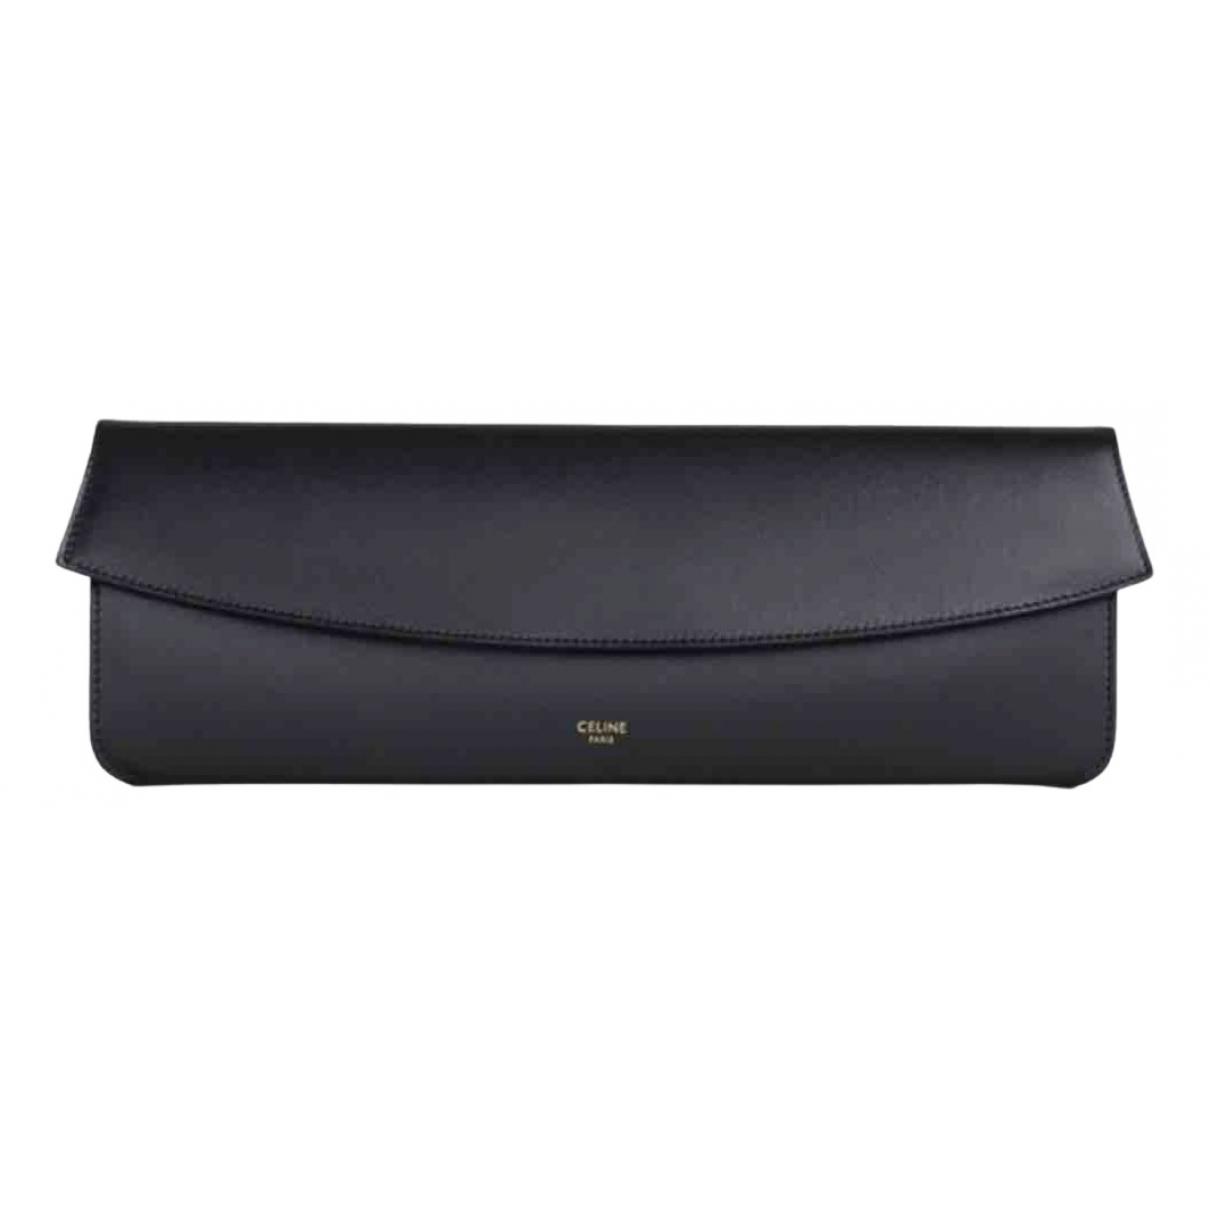 Celine \N Black Leather Clutch bag for Women \N